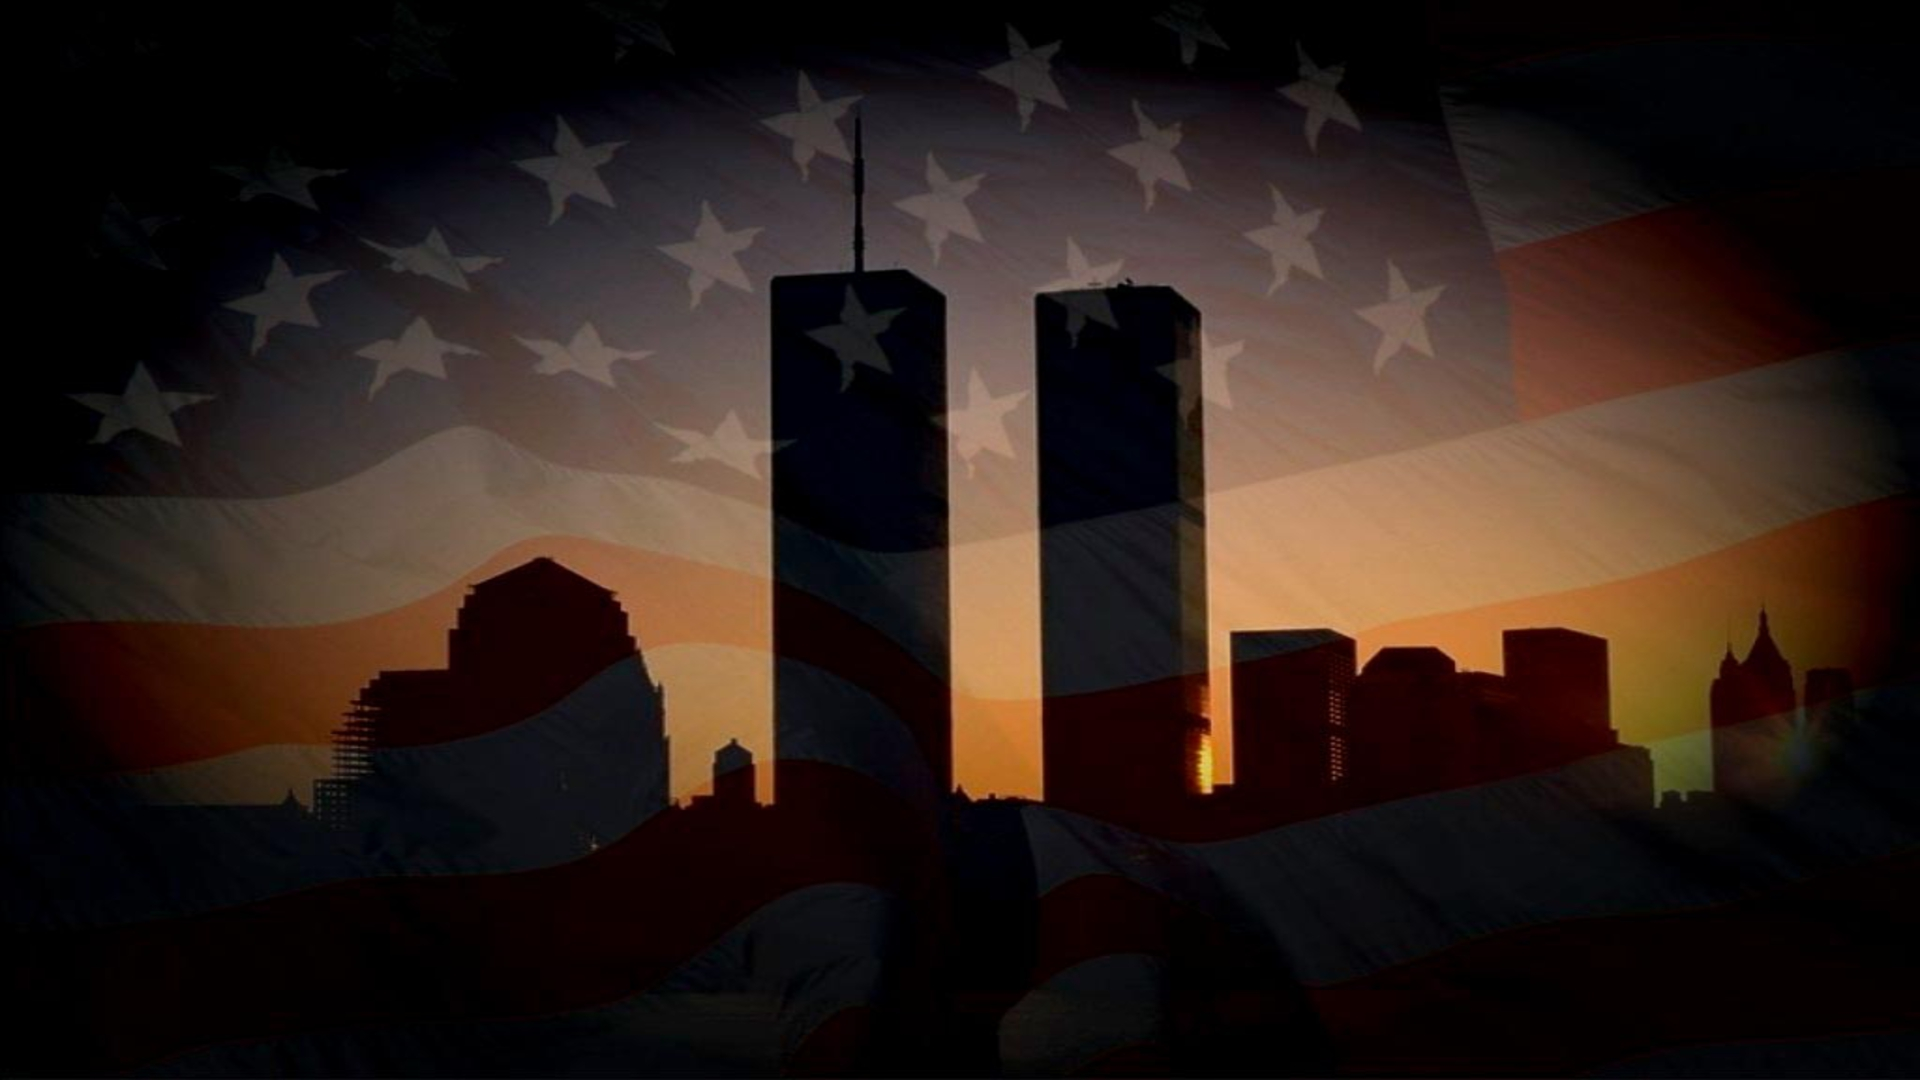 9 11 wallpaper